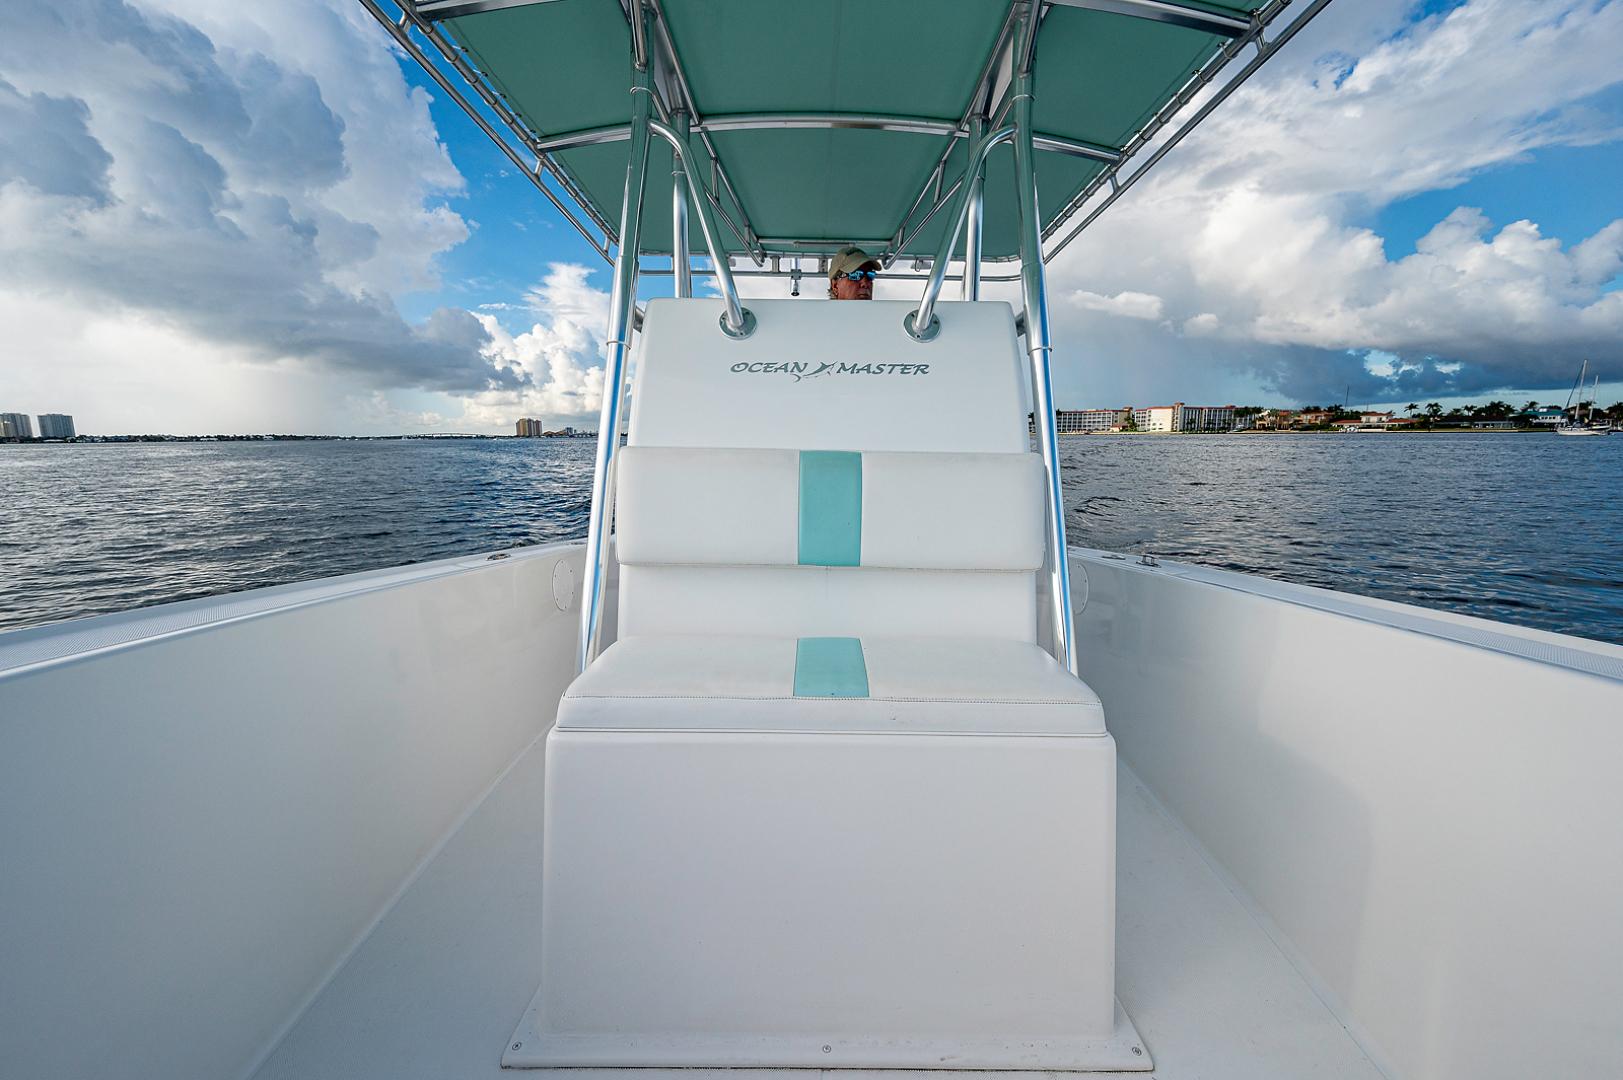 Ocean Master 2013-27 Ocean Master Palm Beach-Florida-United States-Seating-1501365 | Thumbnail